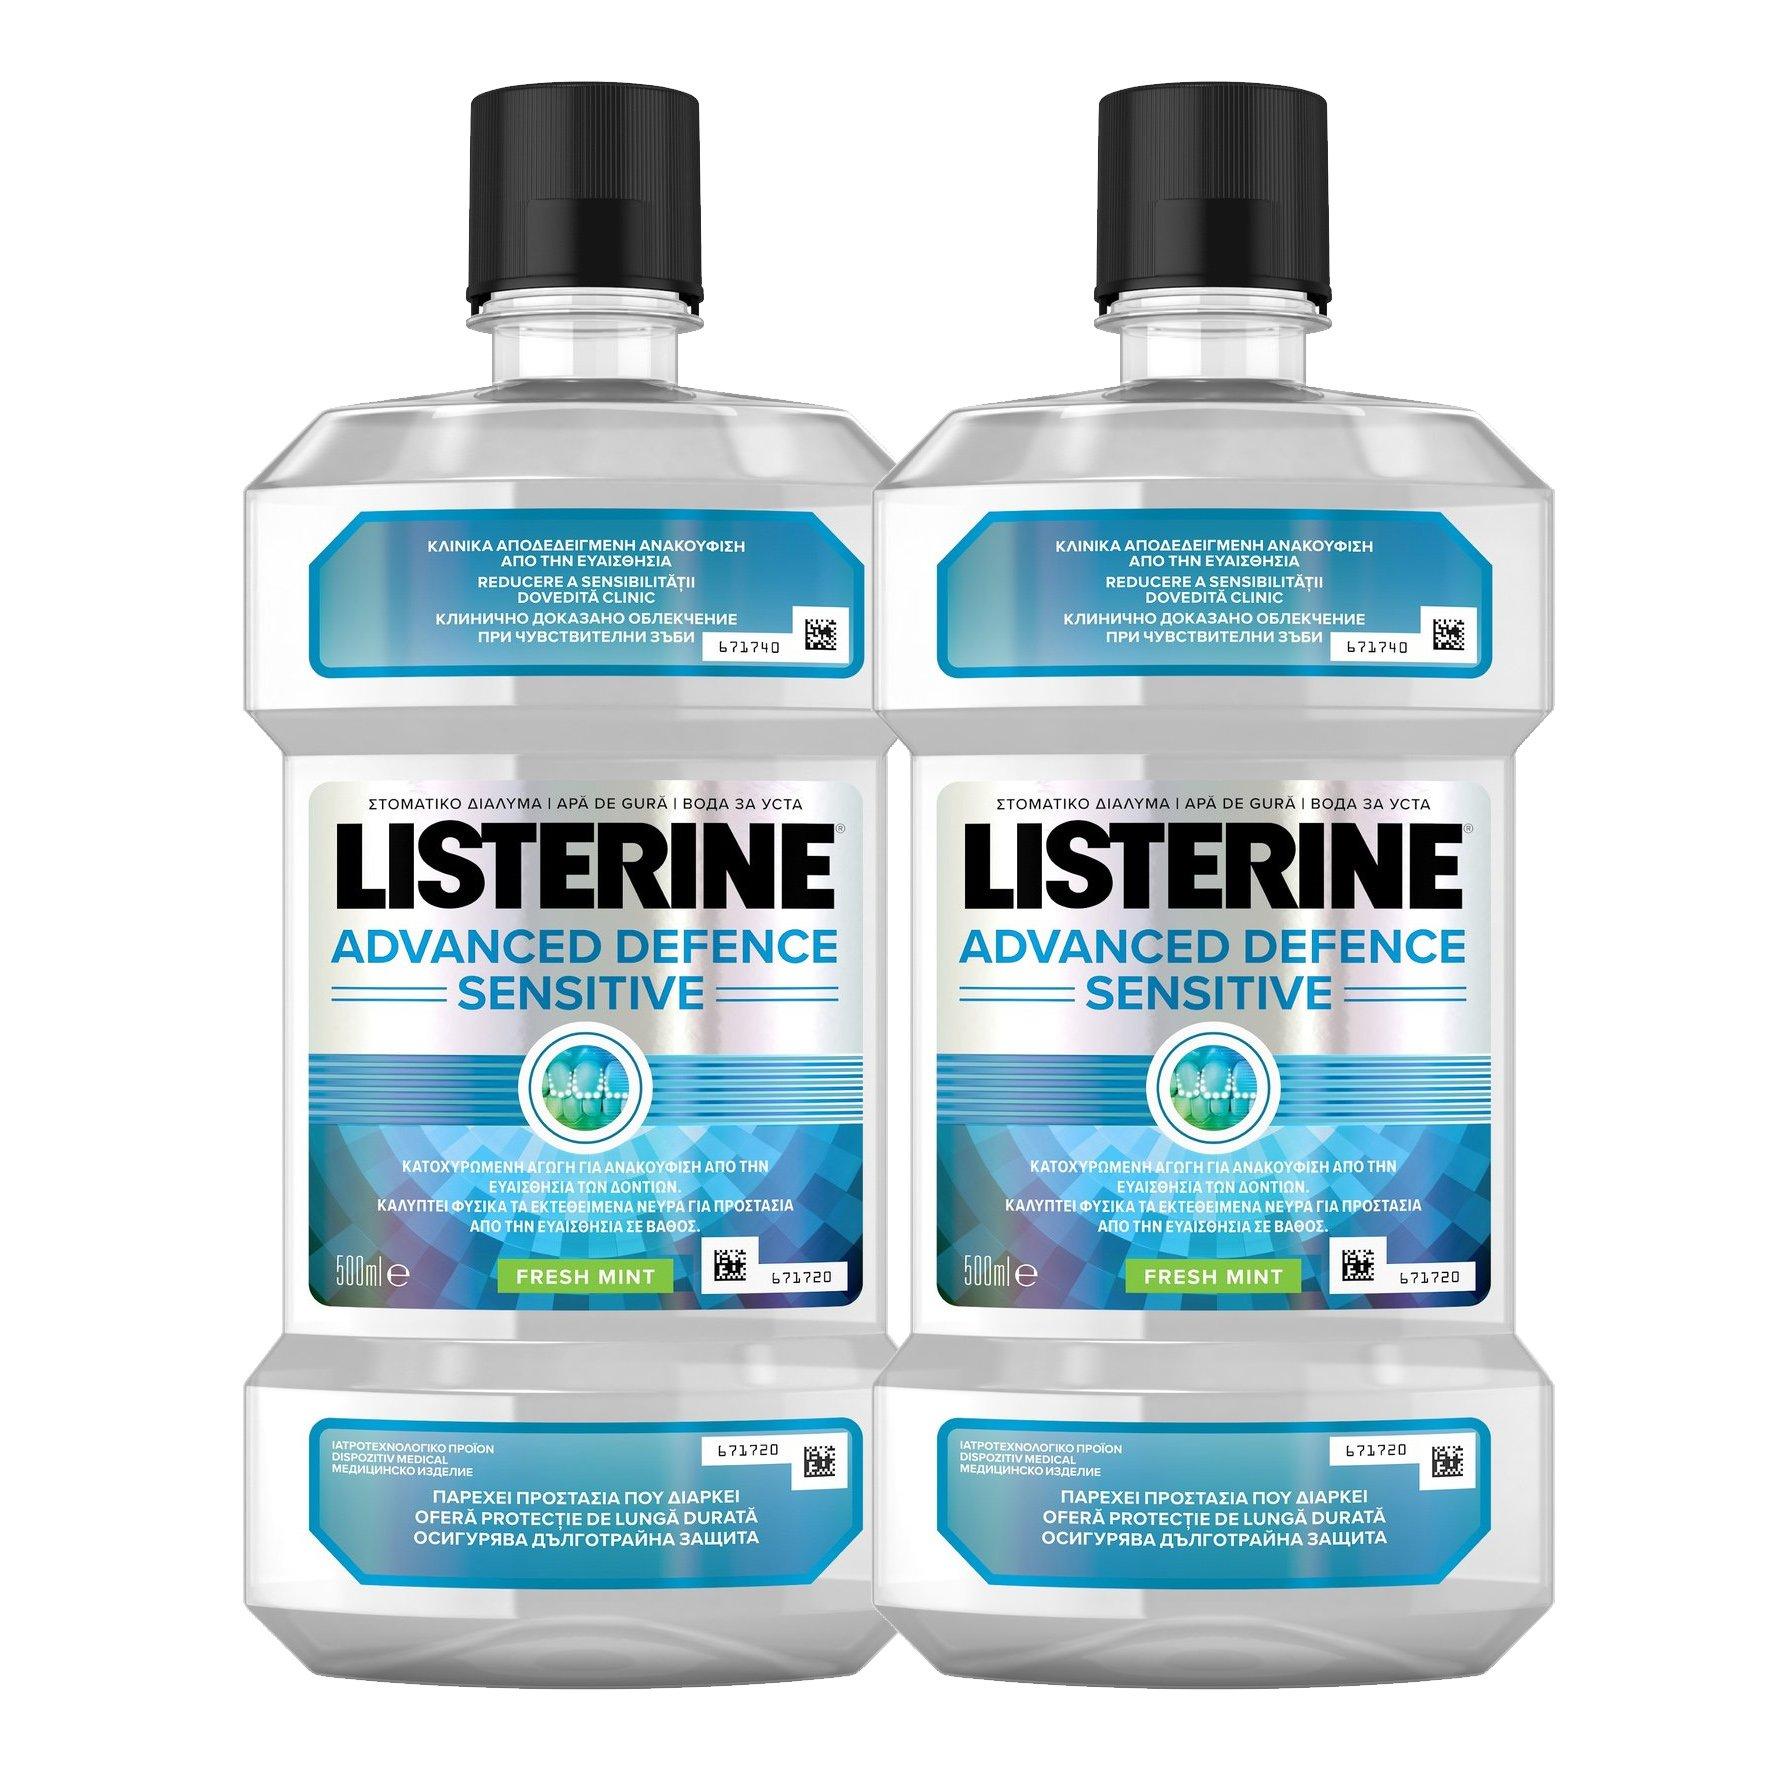 Listerine Πακέτο Προσφοράς Advanced Defence Sensitive Στοματικό Διάλυμα για Ανακούφιση από την Ευαισθησία των Δοντιών 2x500ml